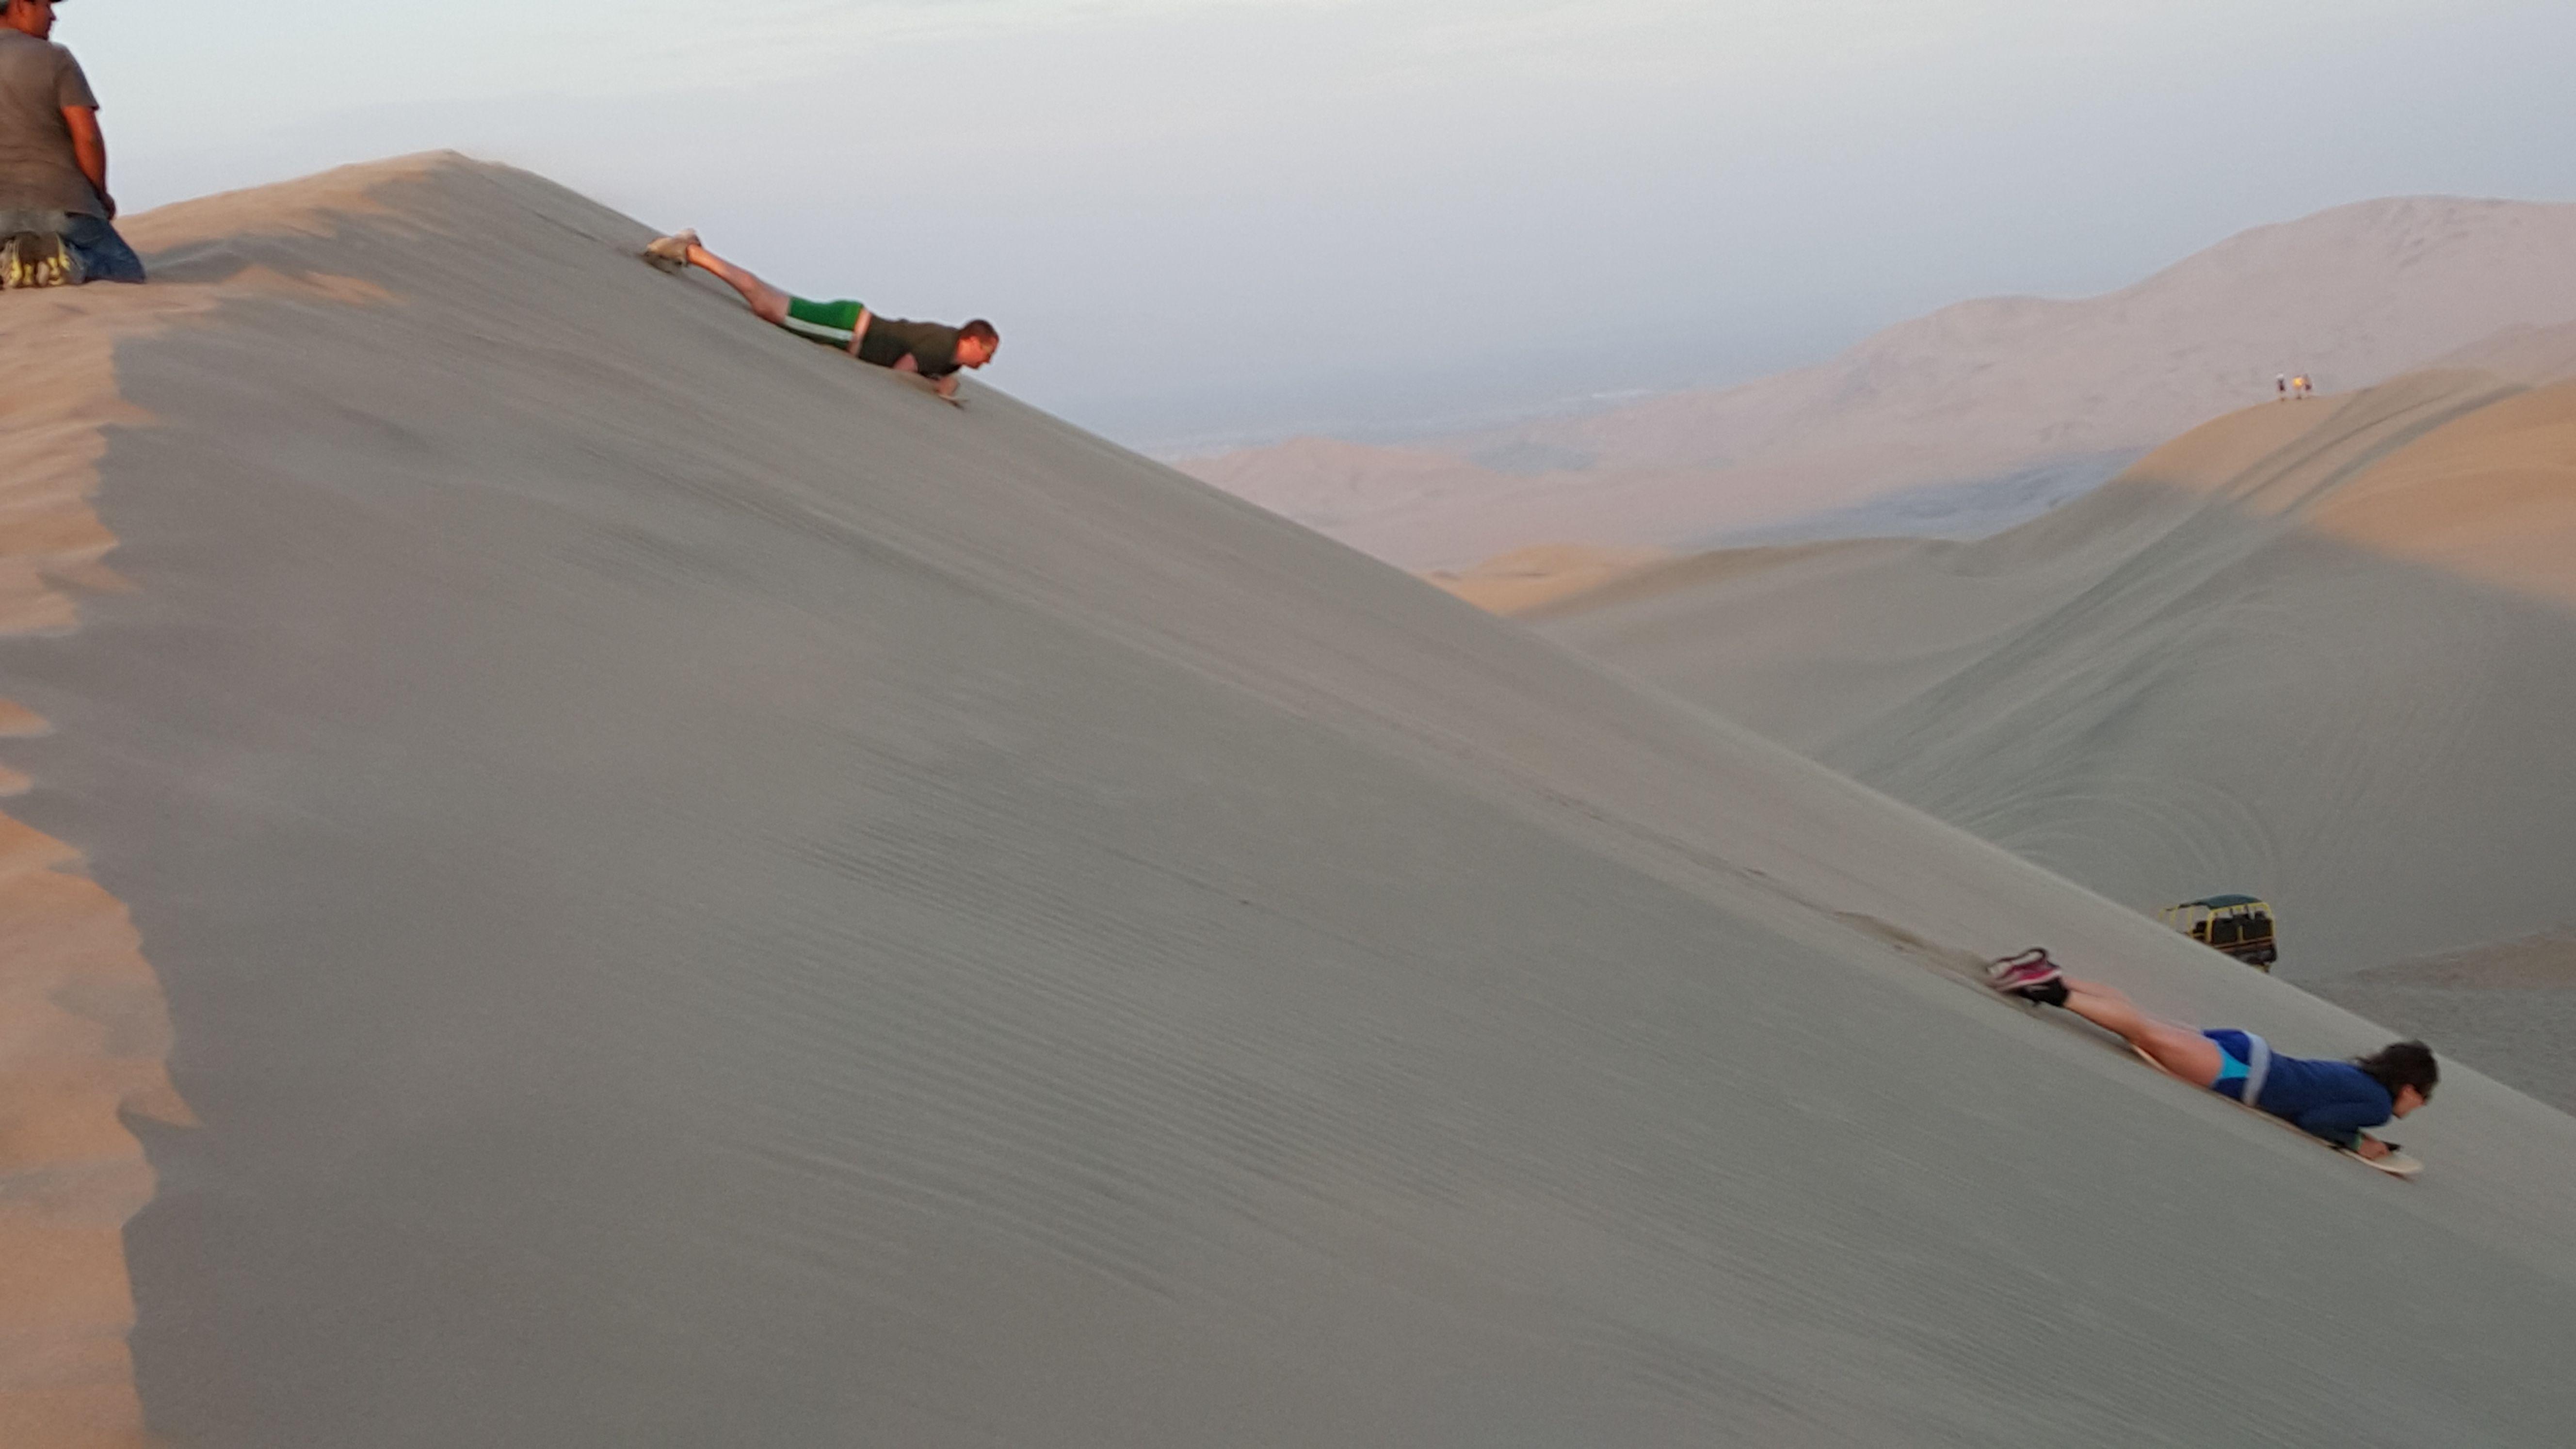 Want Adventure? Sandboarding in Ica should top your list